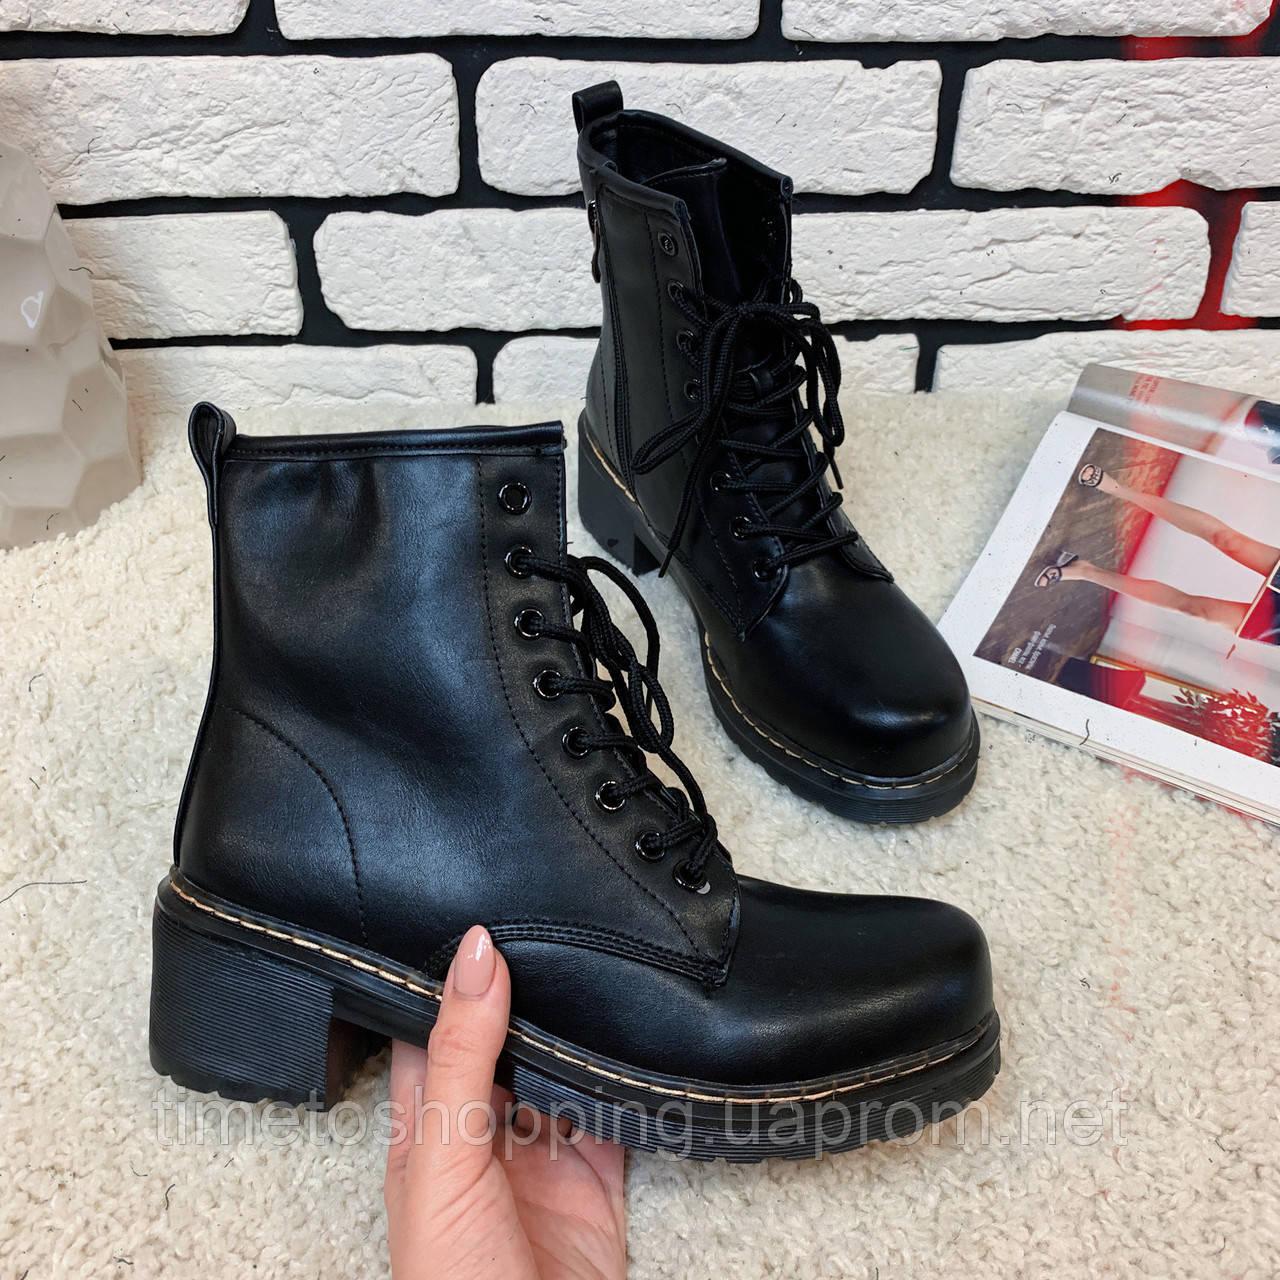 Ботинки женские демисезон РАЗМЕР [40]